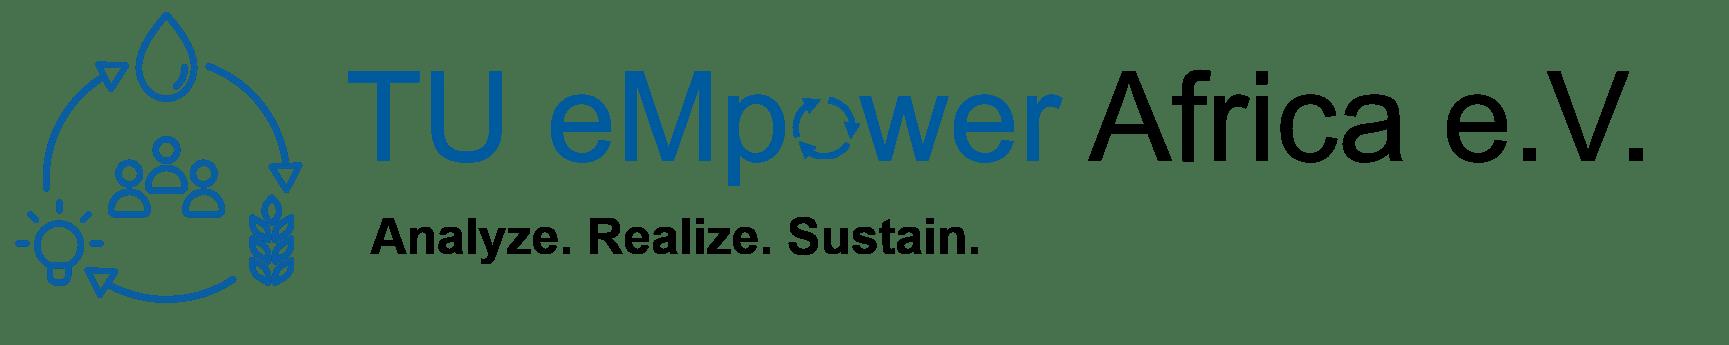 TUM Empower Africa e.V.